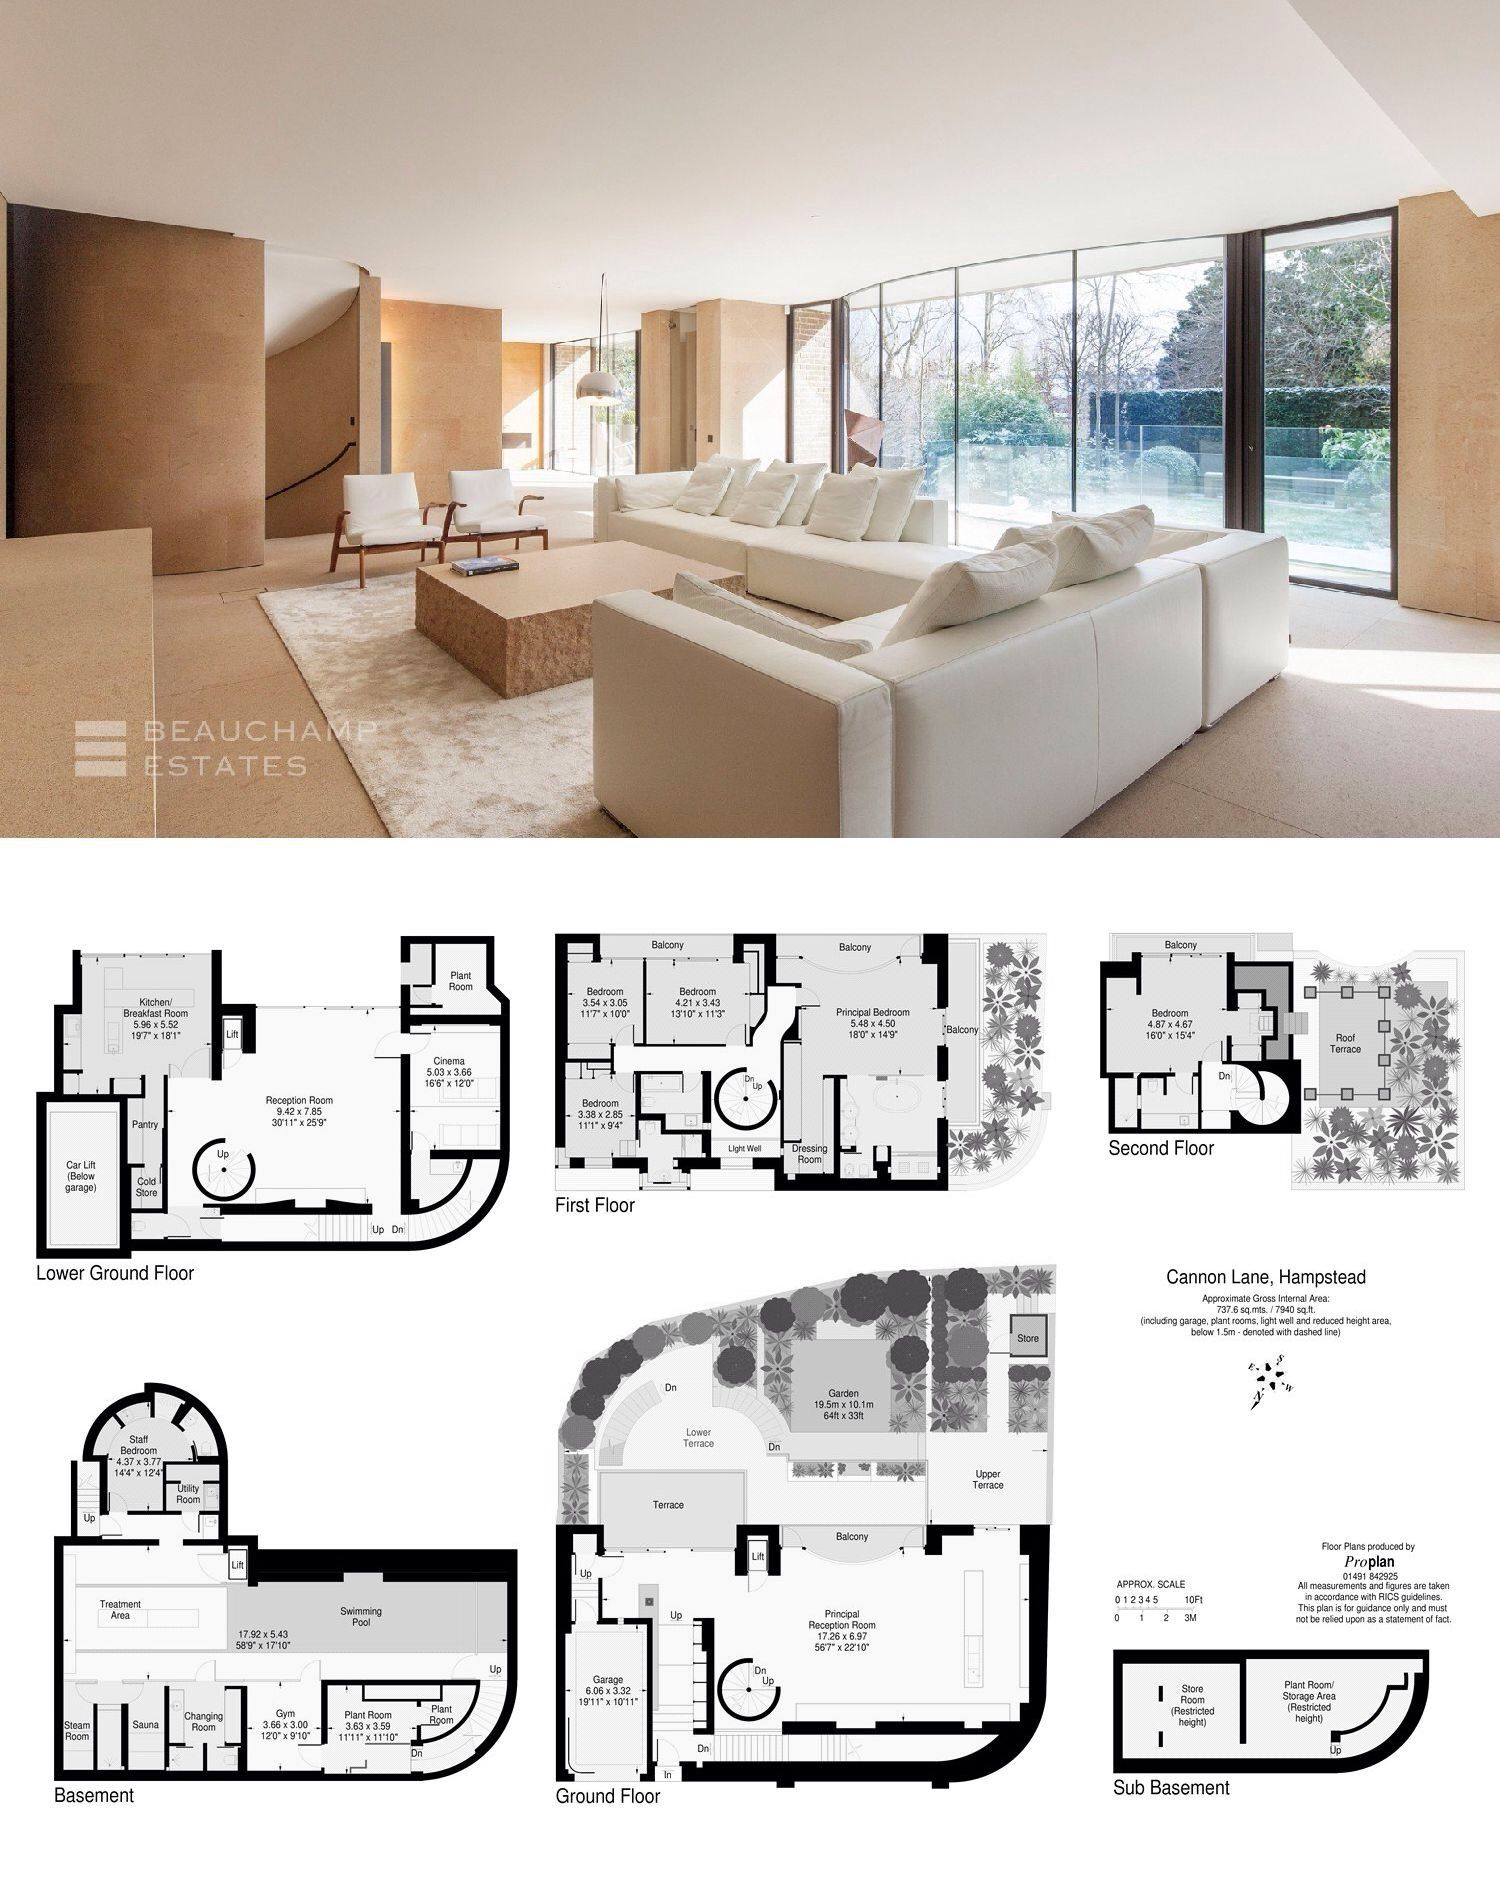 Cannon Lane Nw3 London Minimalist House Design Sale House House Design